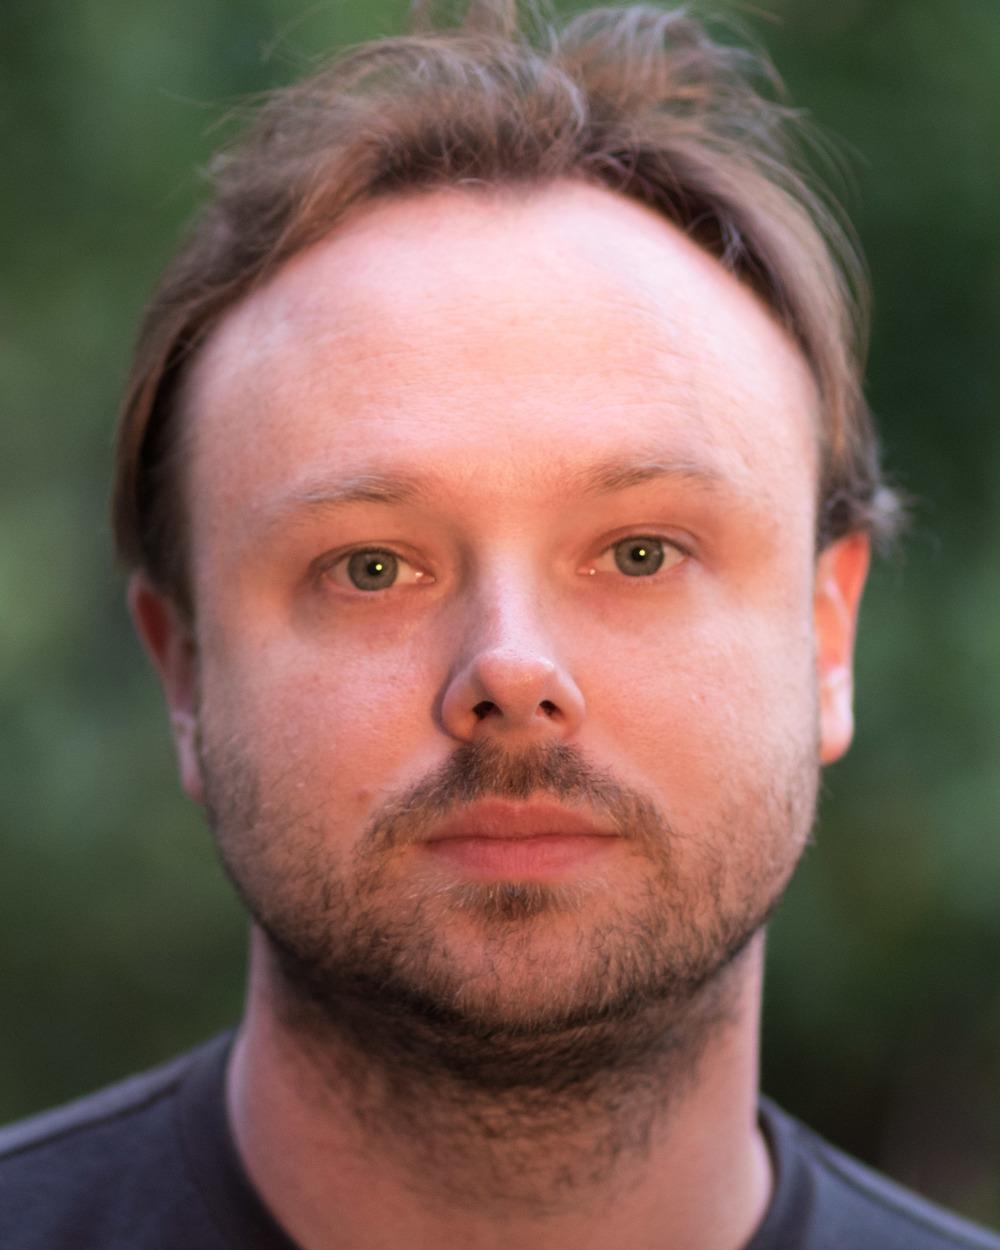 James Gregory - Distinguished Engineer at Zynga